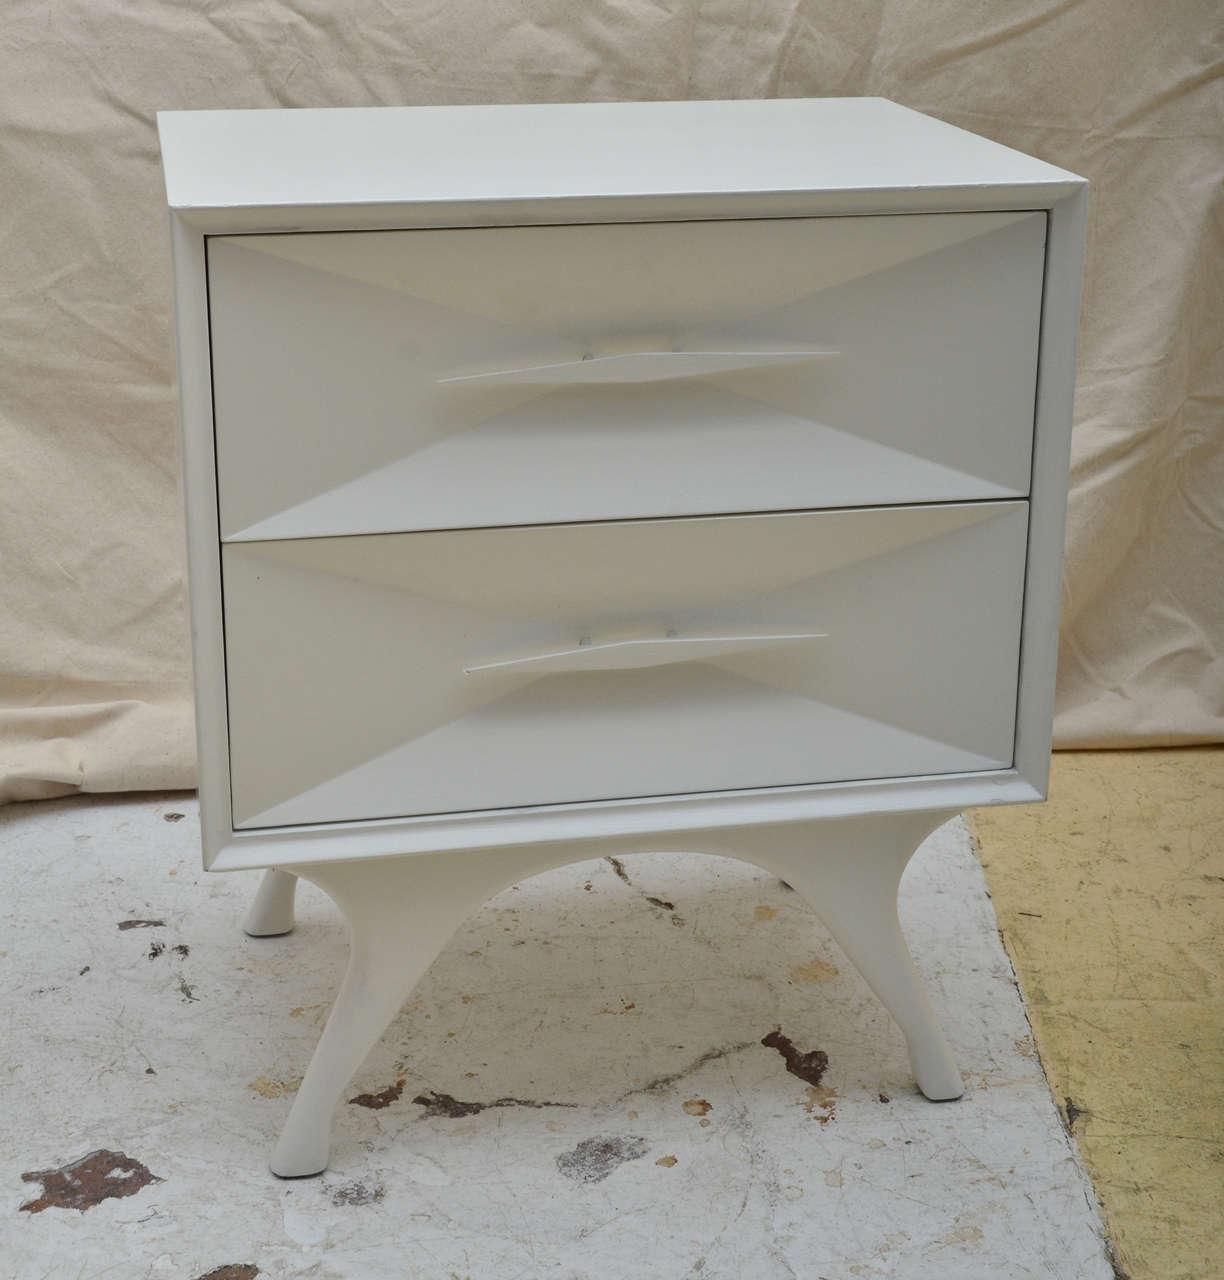 White Mid Century Modern Nightstand Part - 45: Pair White Painted Mid Century Modern Bedside Tables 2